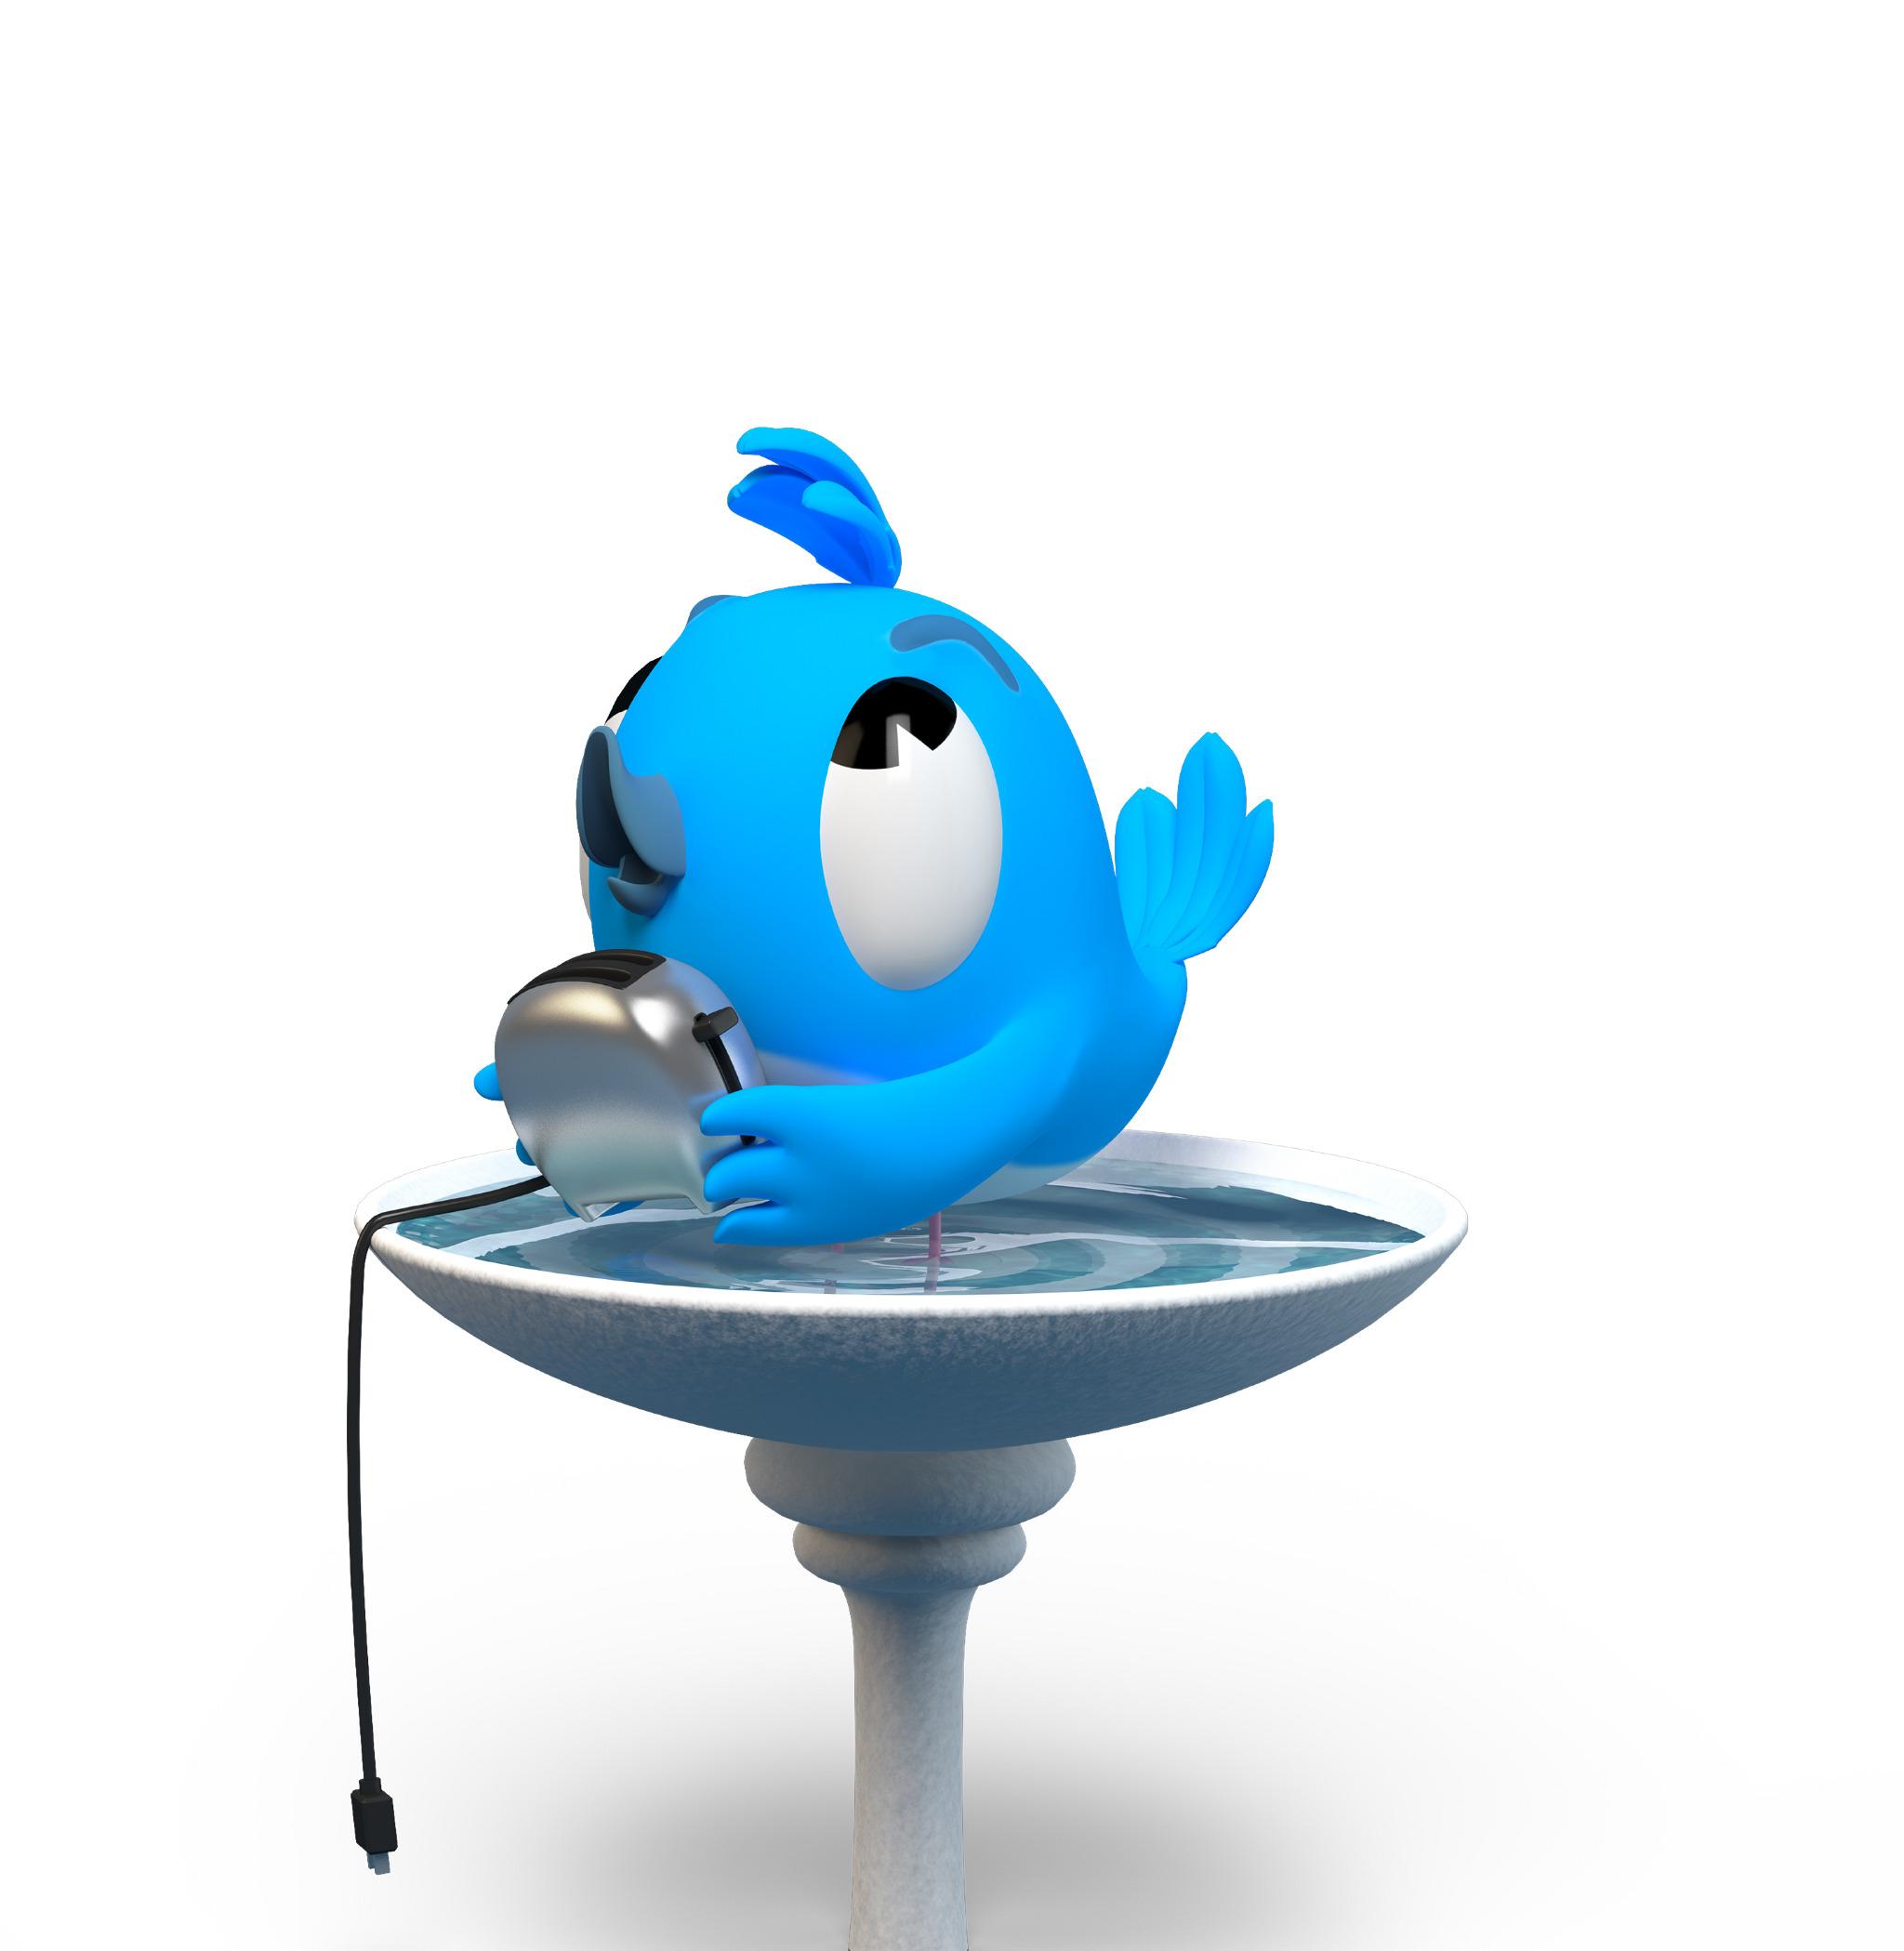 Twitter-Bird-Bloomberg-Businessweek-Toast_o.jpg